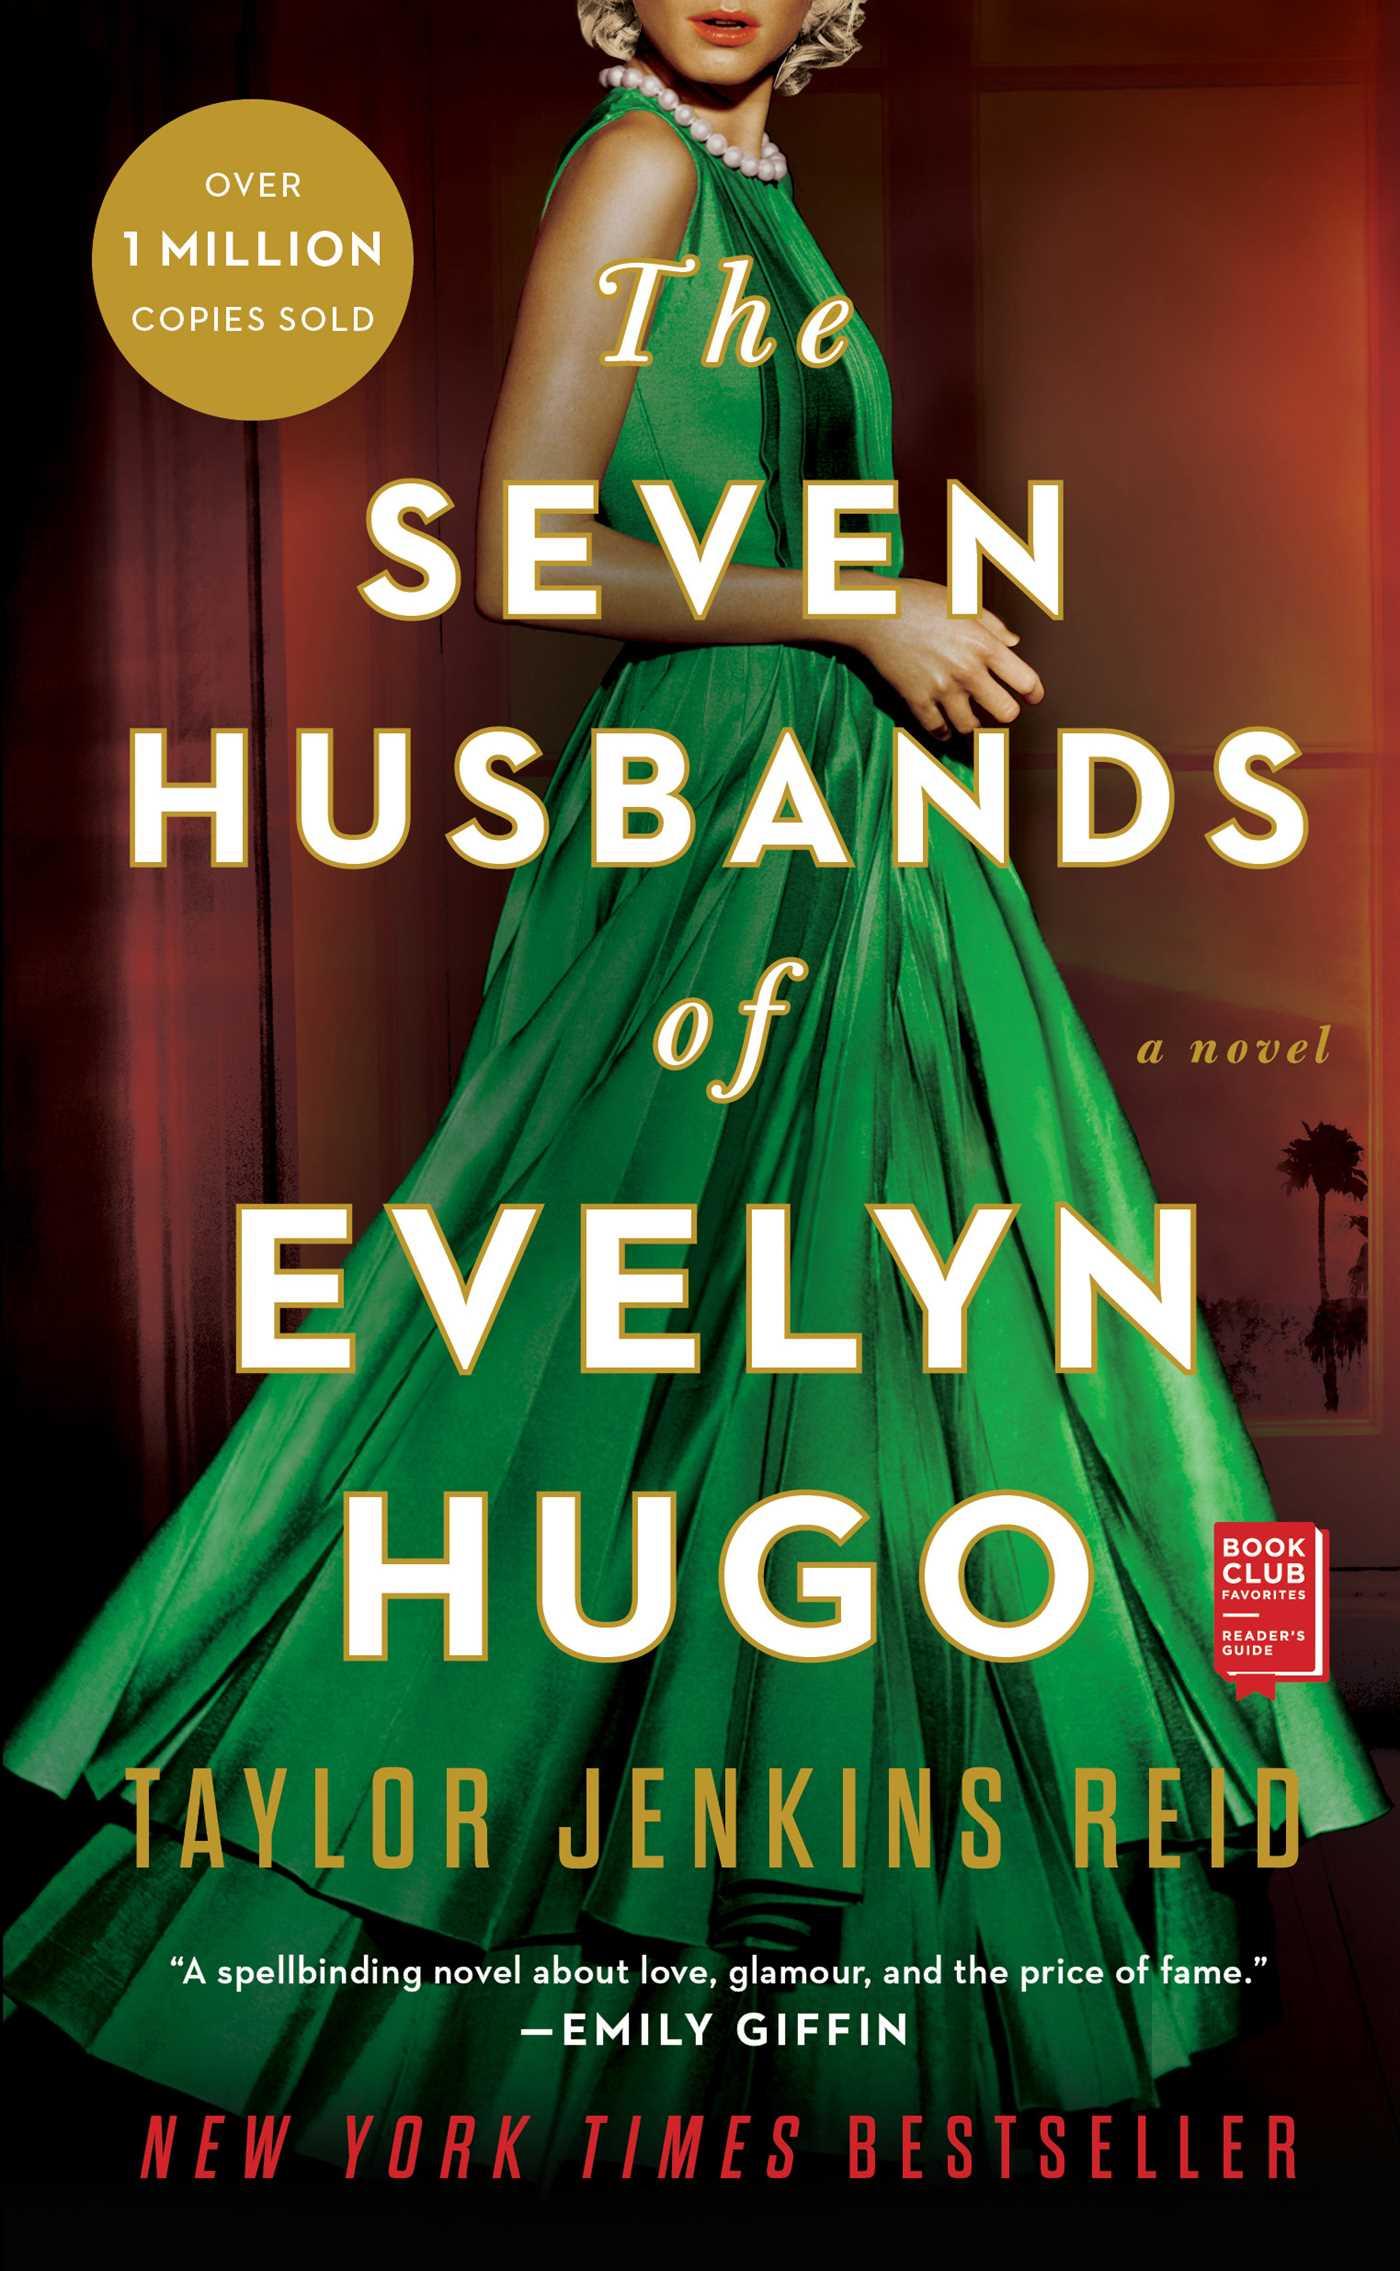 The seven husbands of Evelyn Hugo cover image